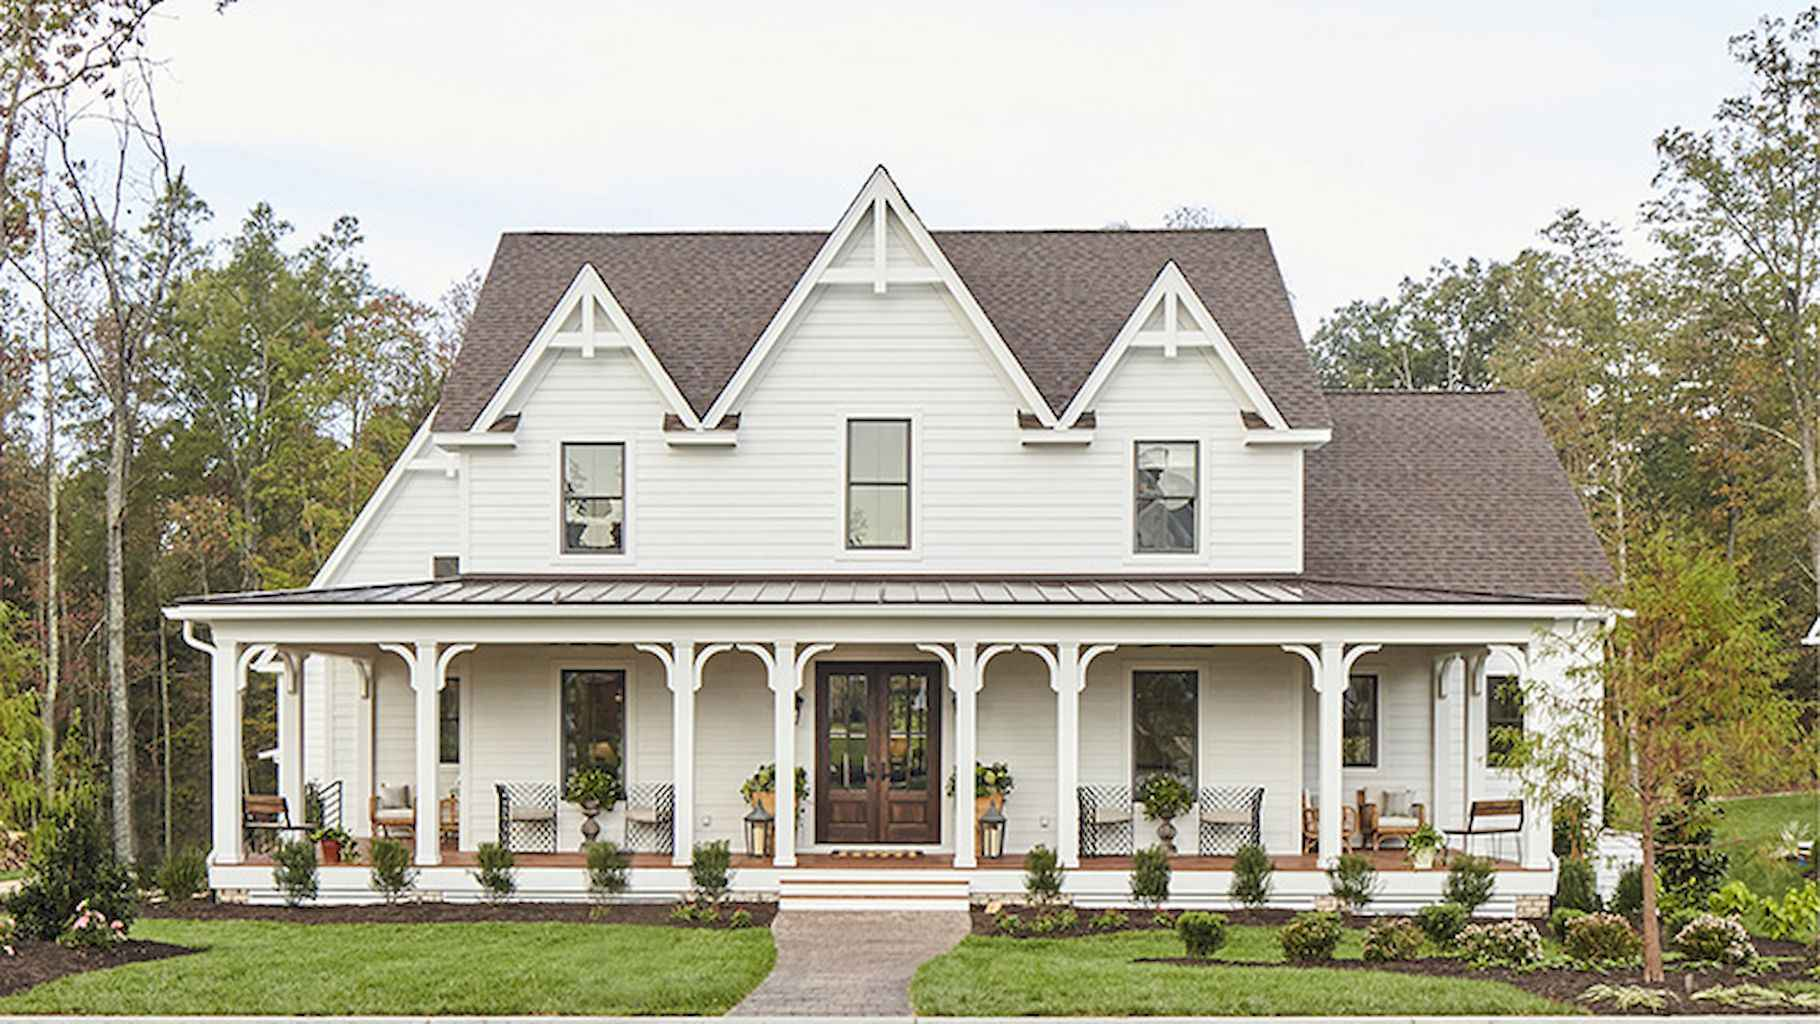 60 amazing farmhouse plans cracker style design ideas (39)